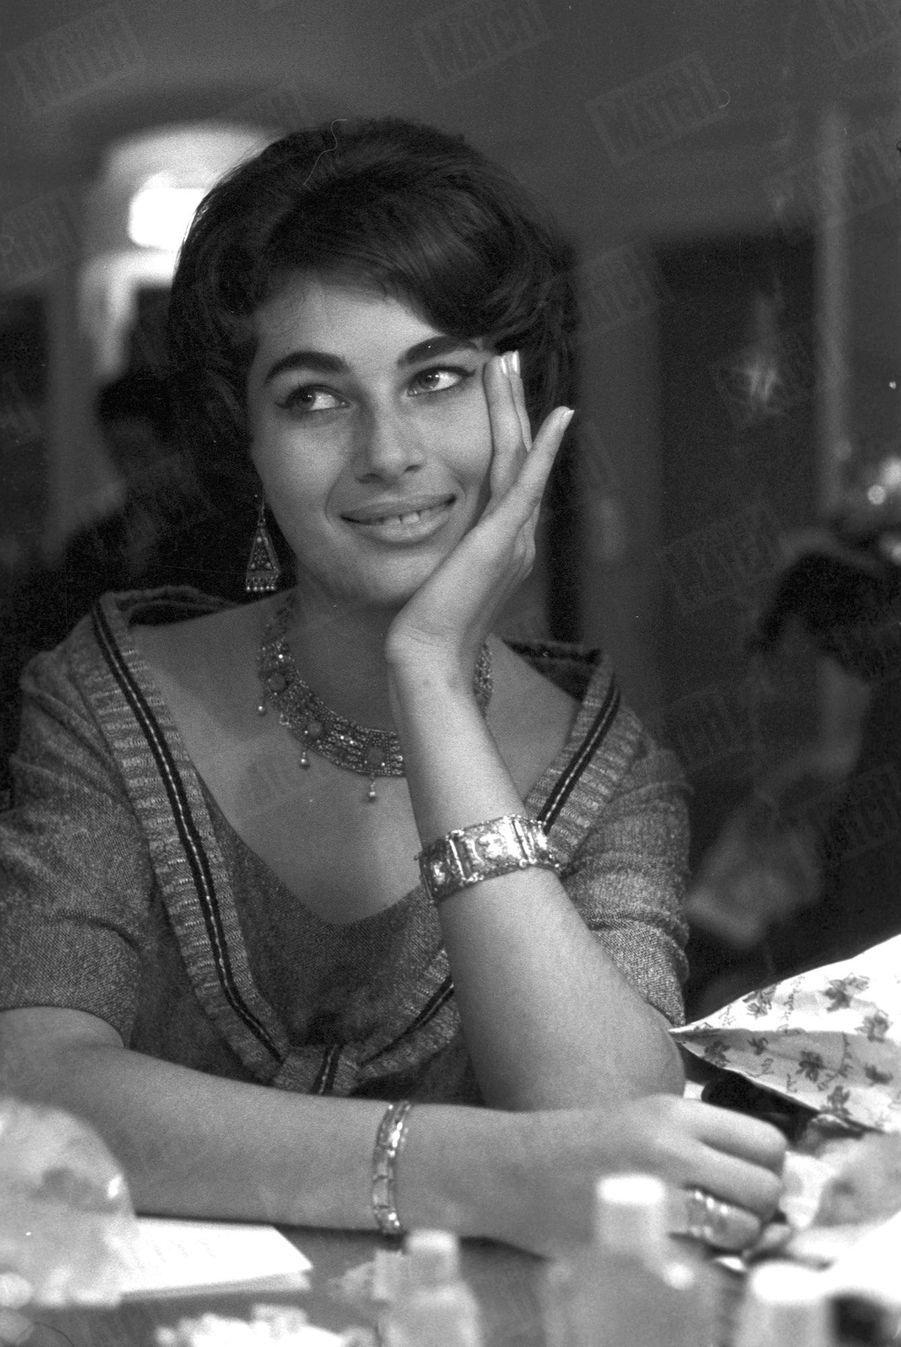 Ziva Shomrat, Miss Israël en coulisse